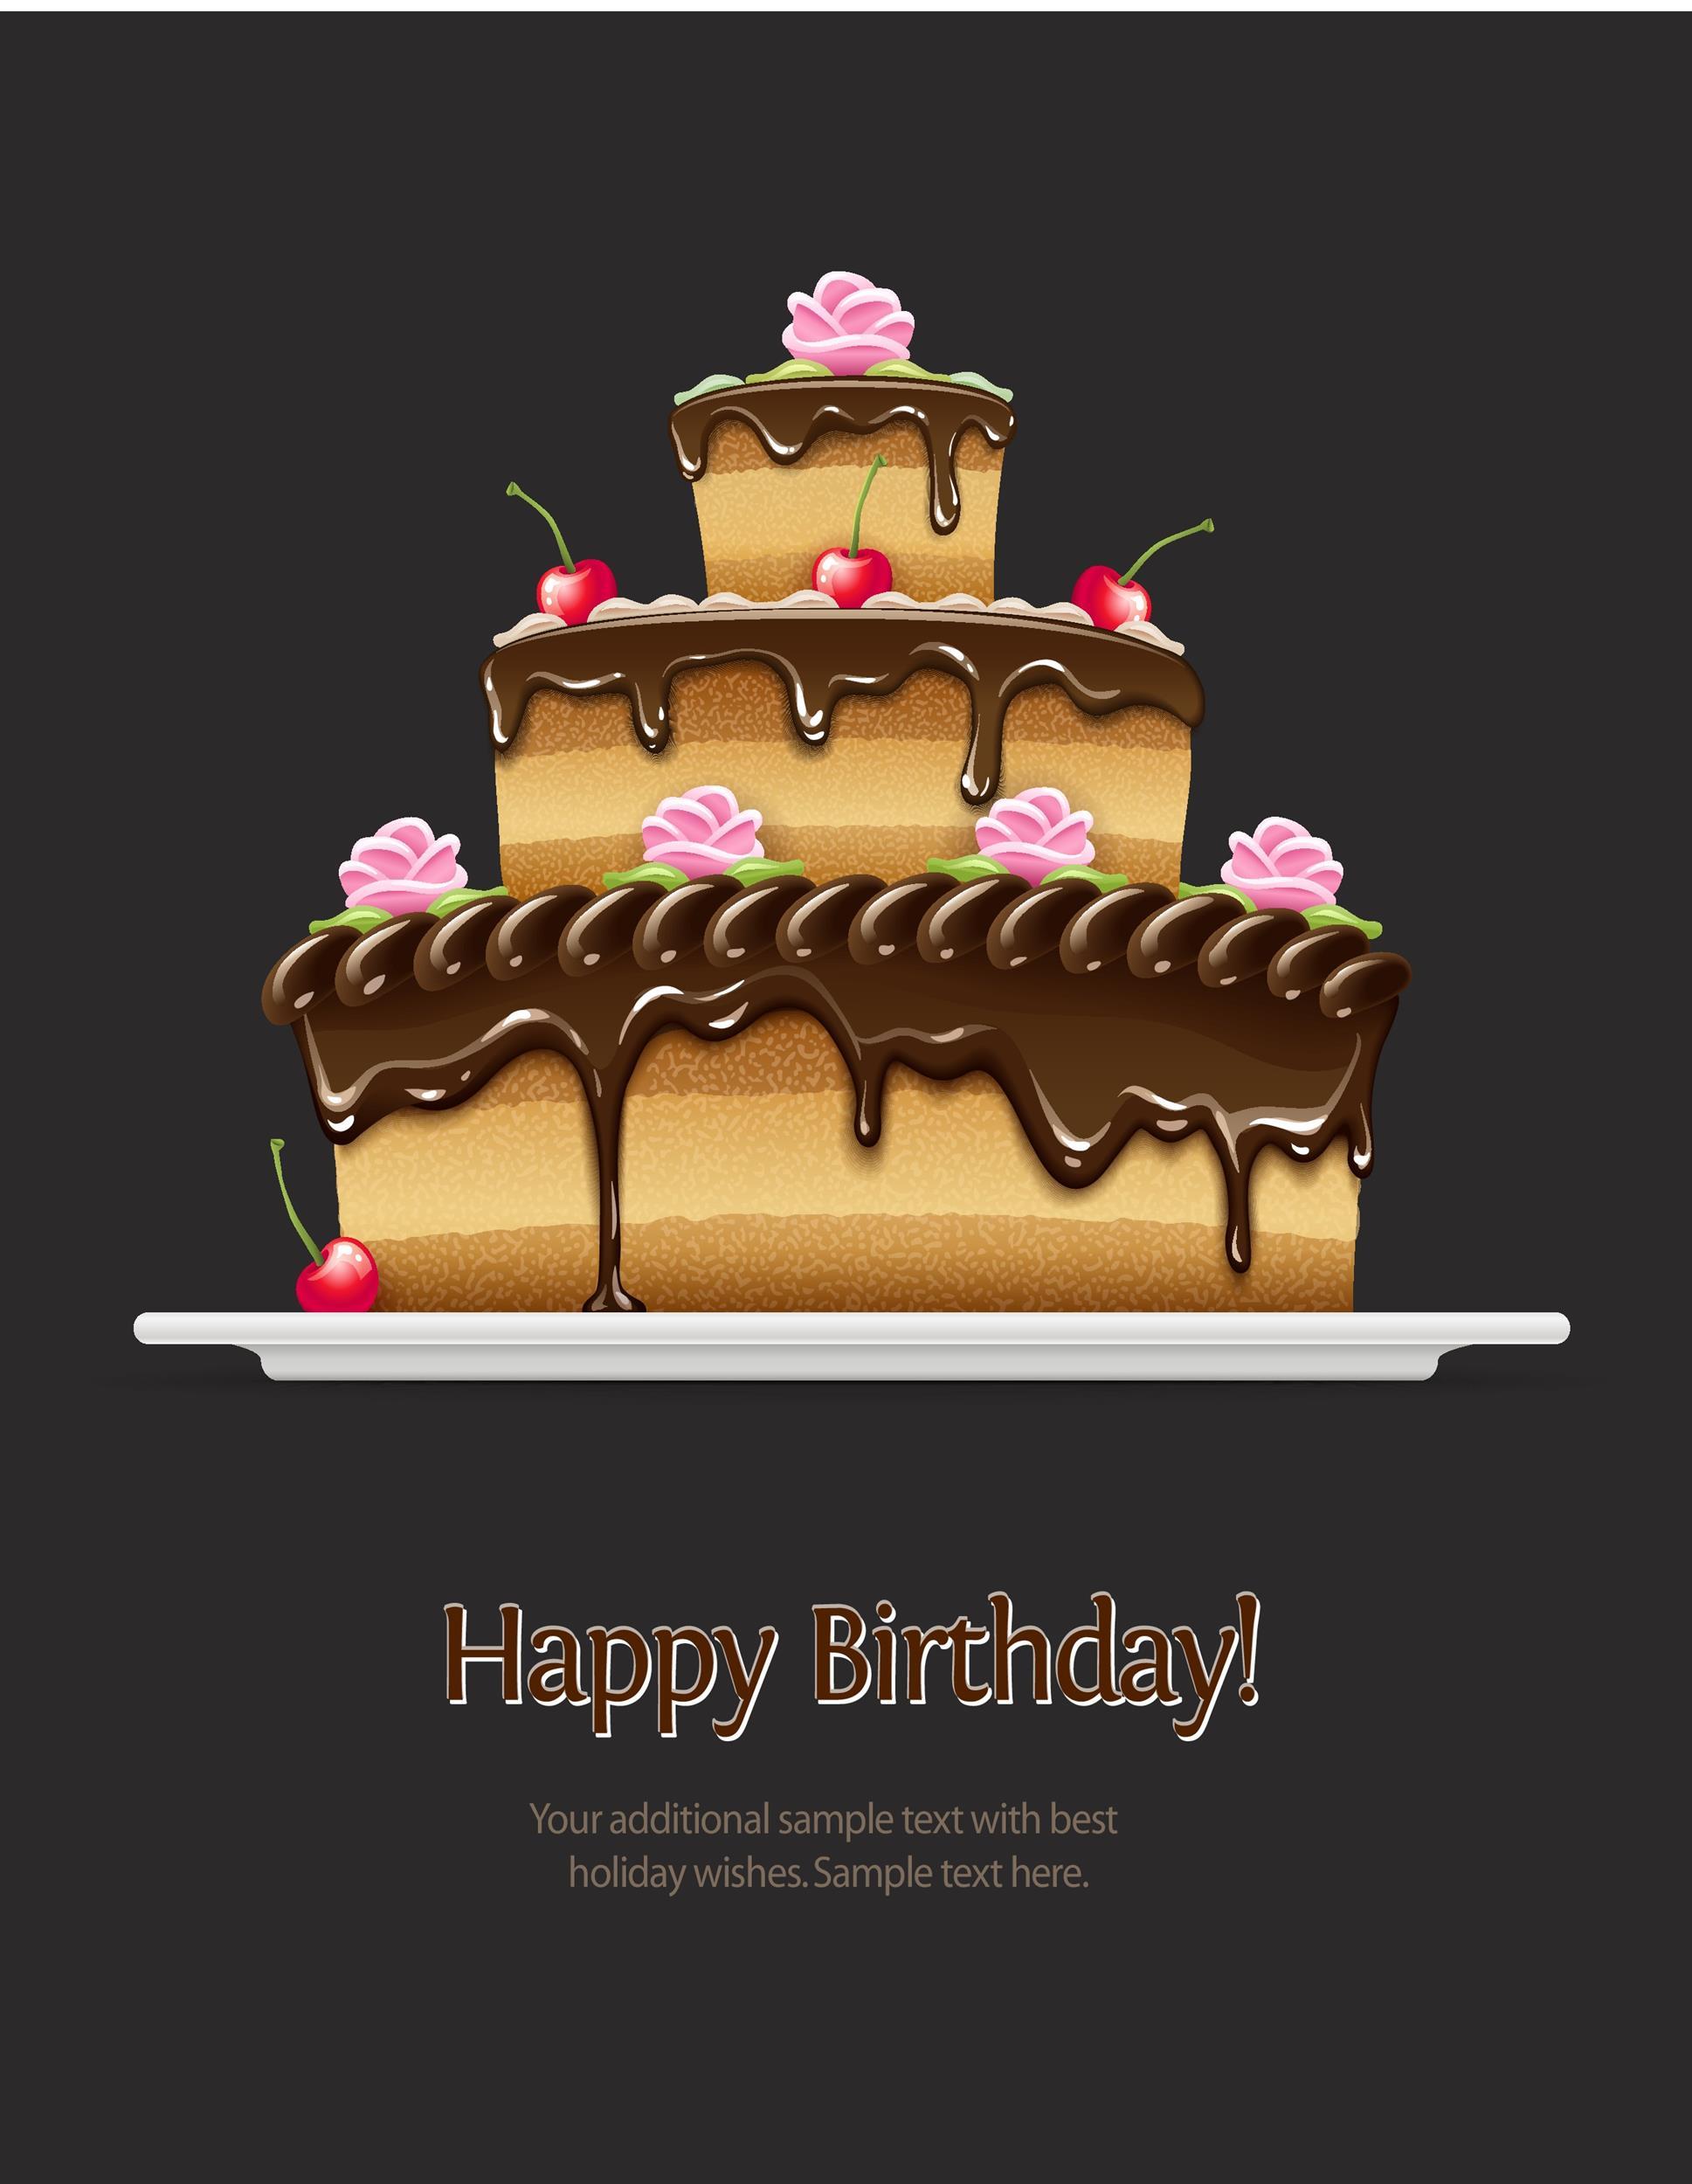 Free birthday card template 08